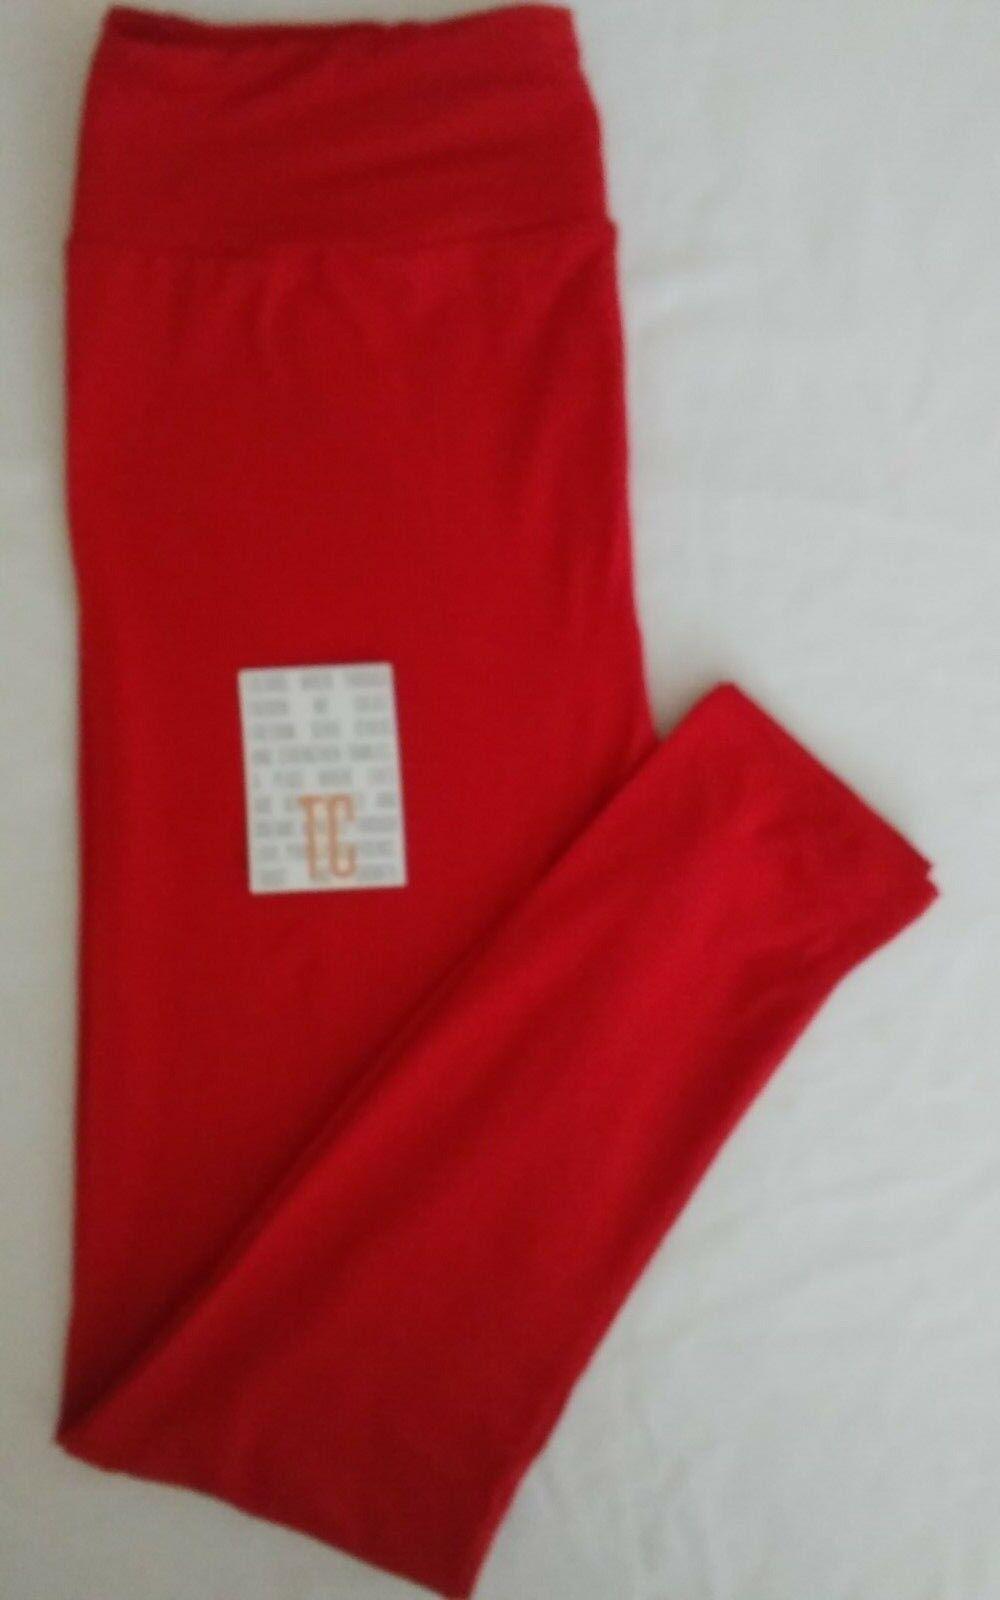 BUTTERY SOFT LULAROE   SIZE TC   UNICORN SOLID RED LEGGINGS   LAST PAIR